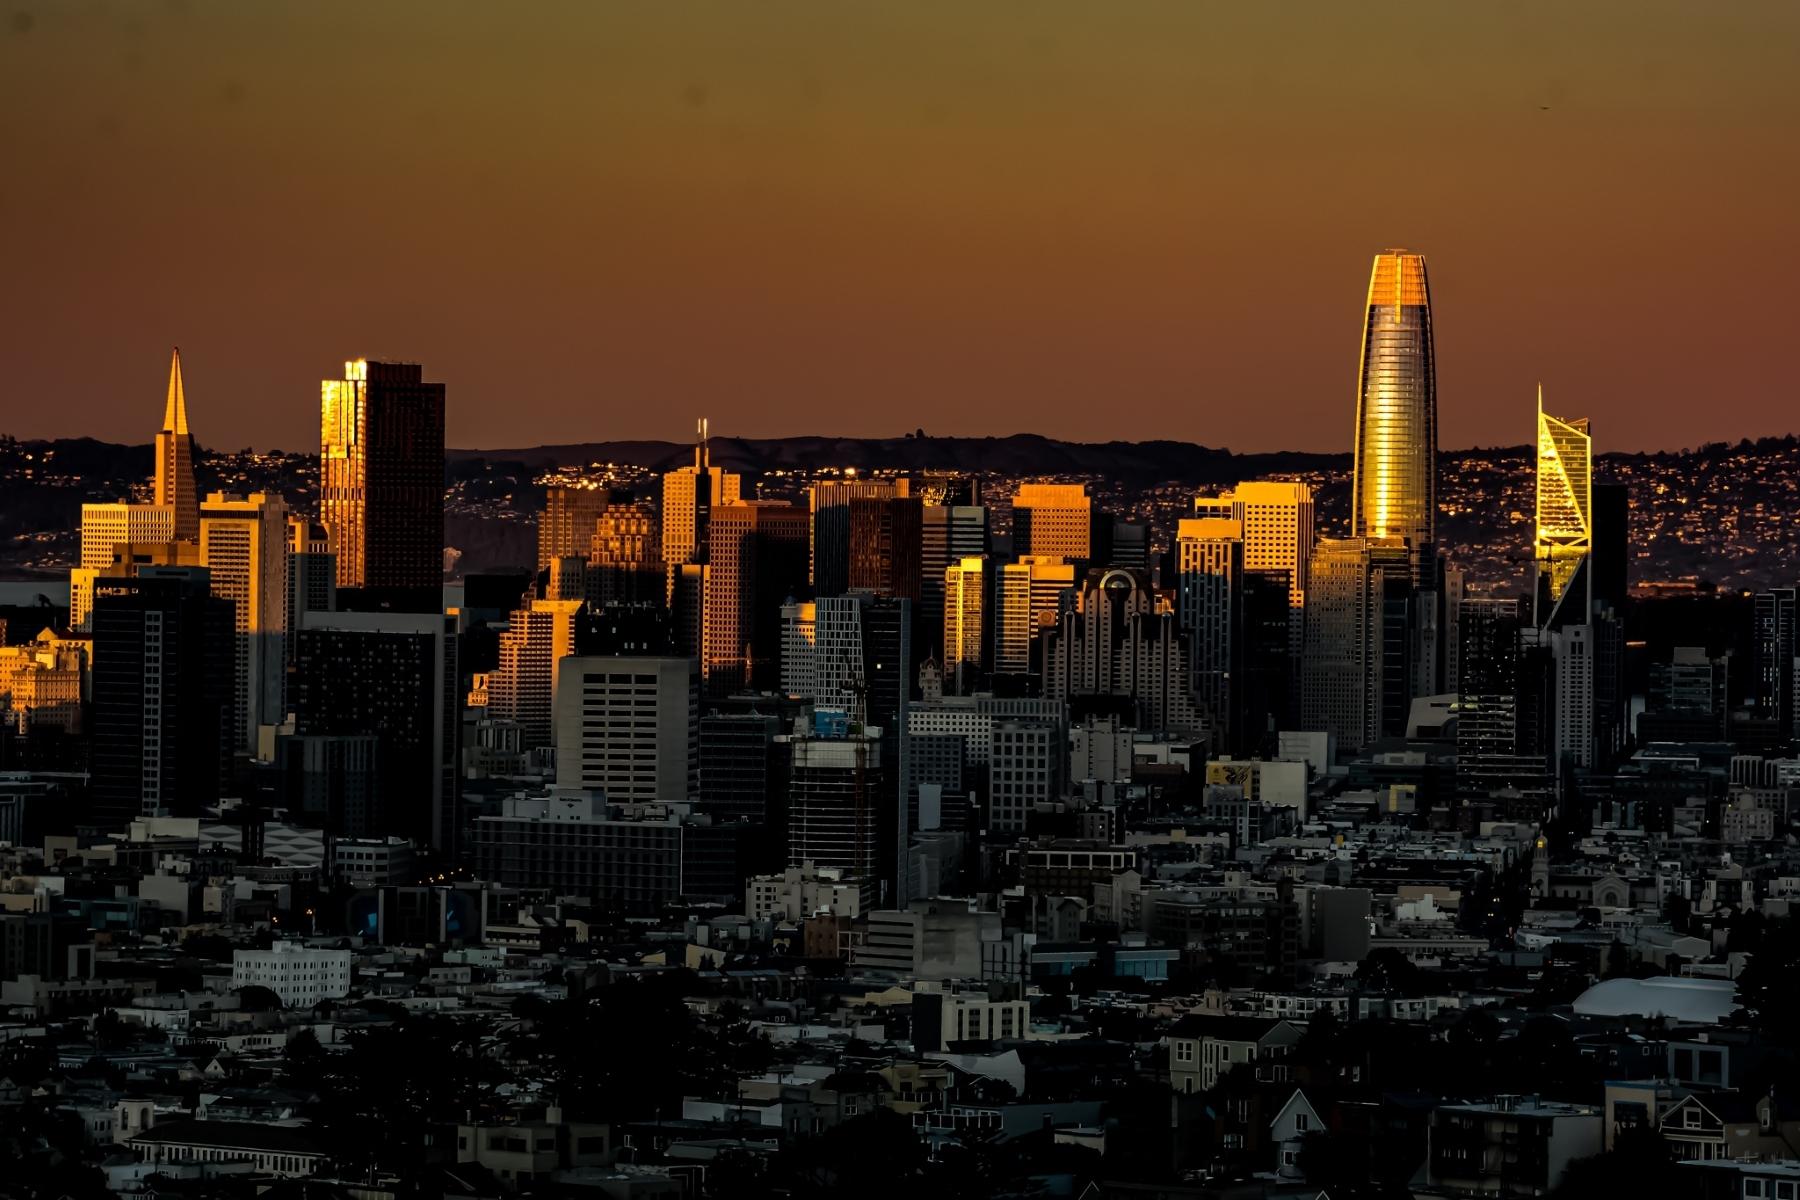 Sunlight-gradually-fades-over-the-SF-skyline-PB-1-Place-by-Herb-Deitz-ML